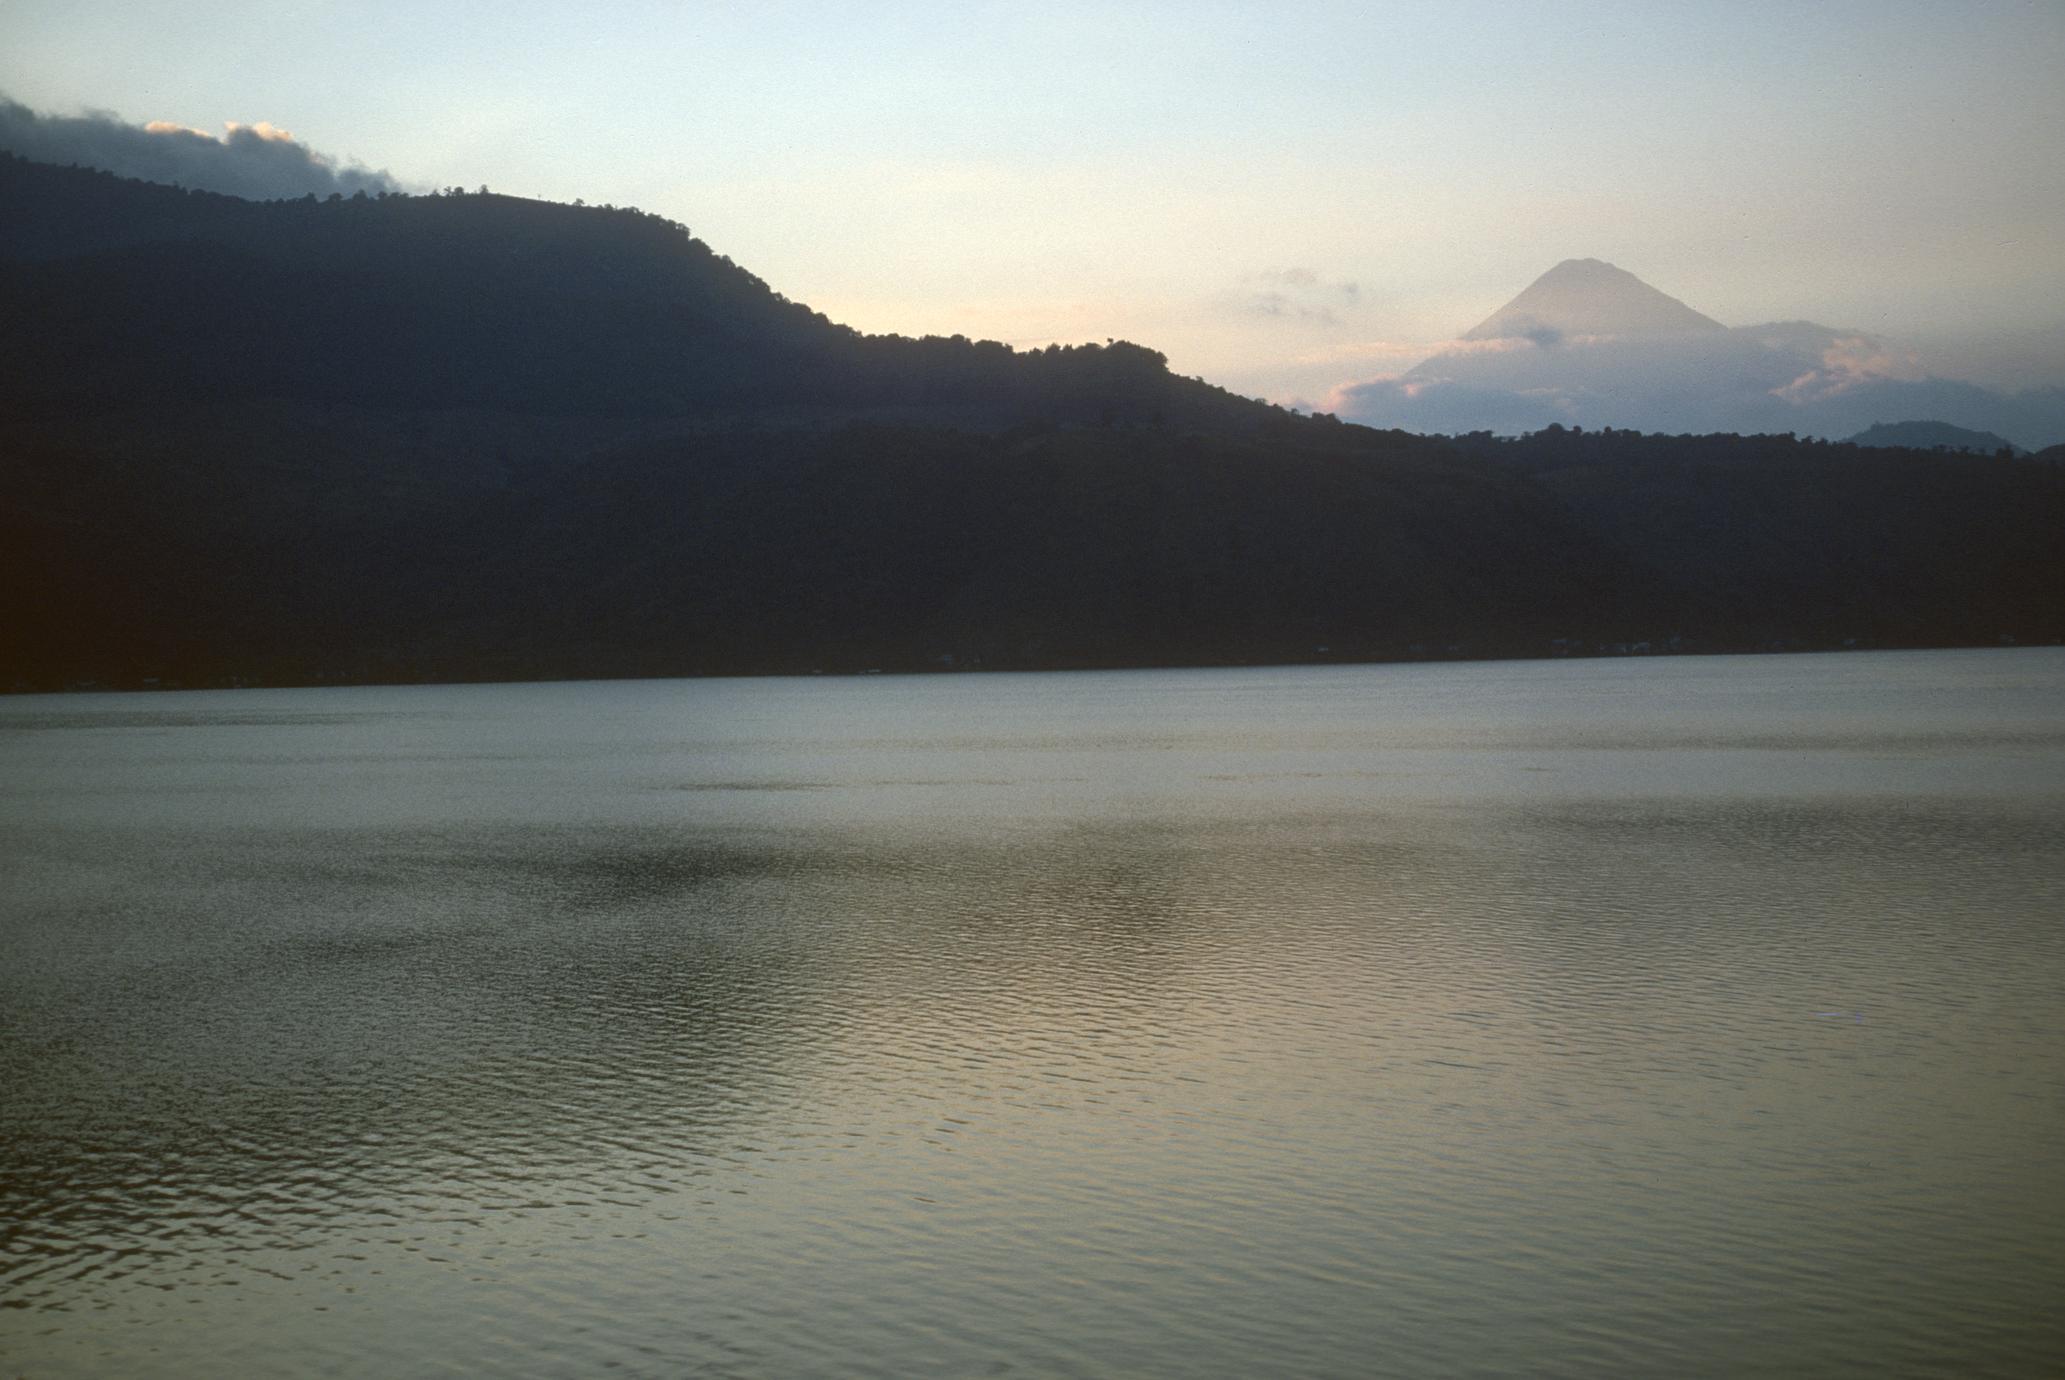 Sunset, Lago Amatitlán looking northwest